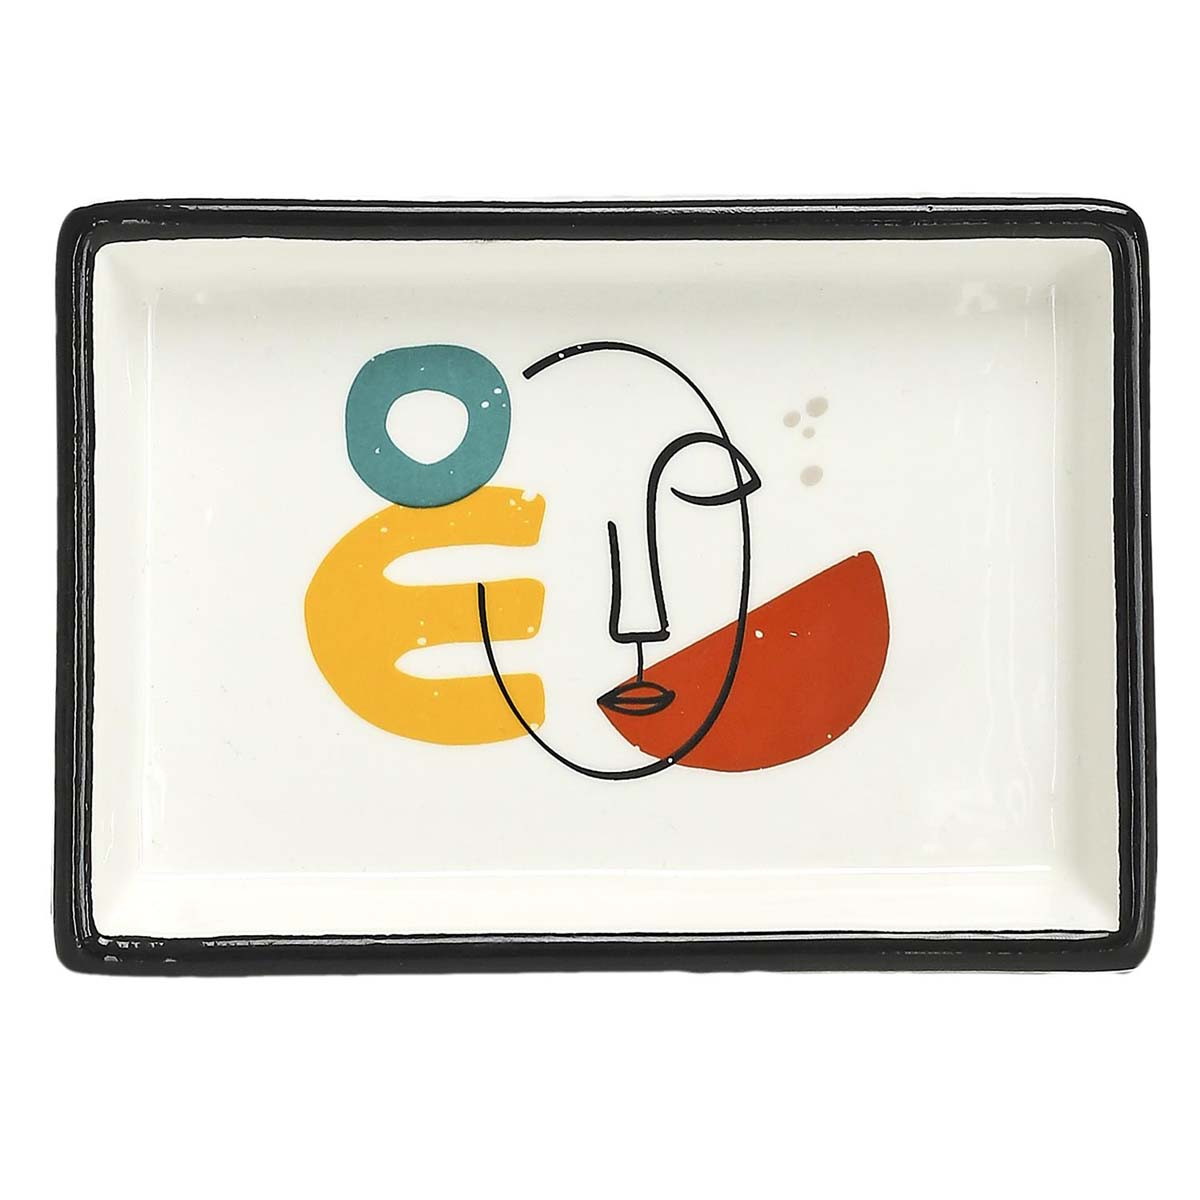 Vide-poches céramique \'Arty\' multicolore blanc - 155x105x25 cm - [A0899]